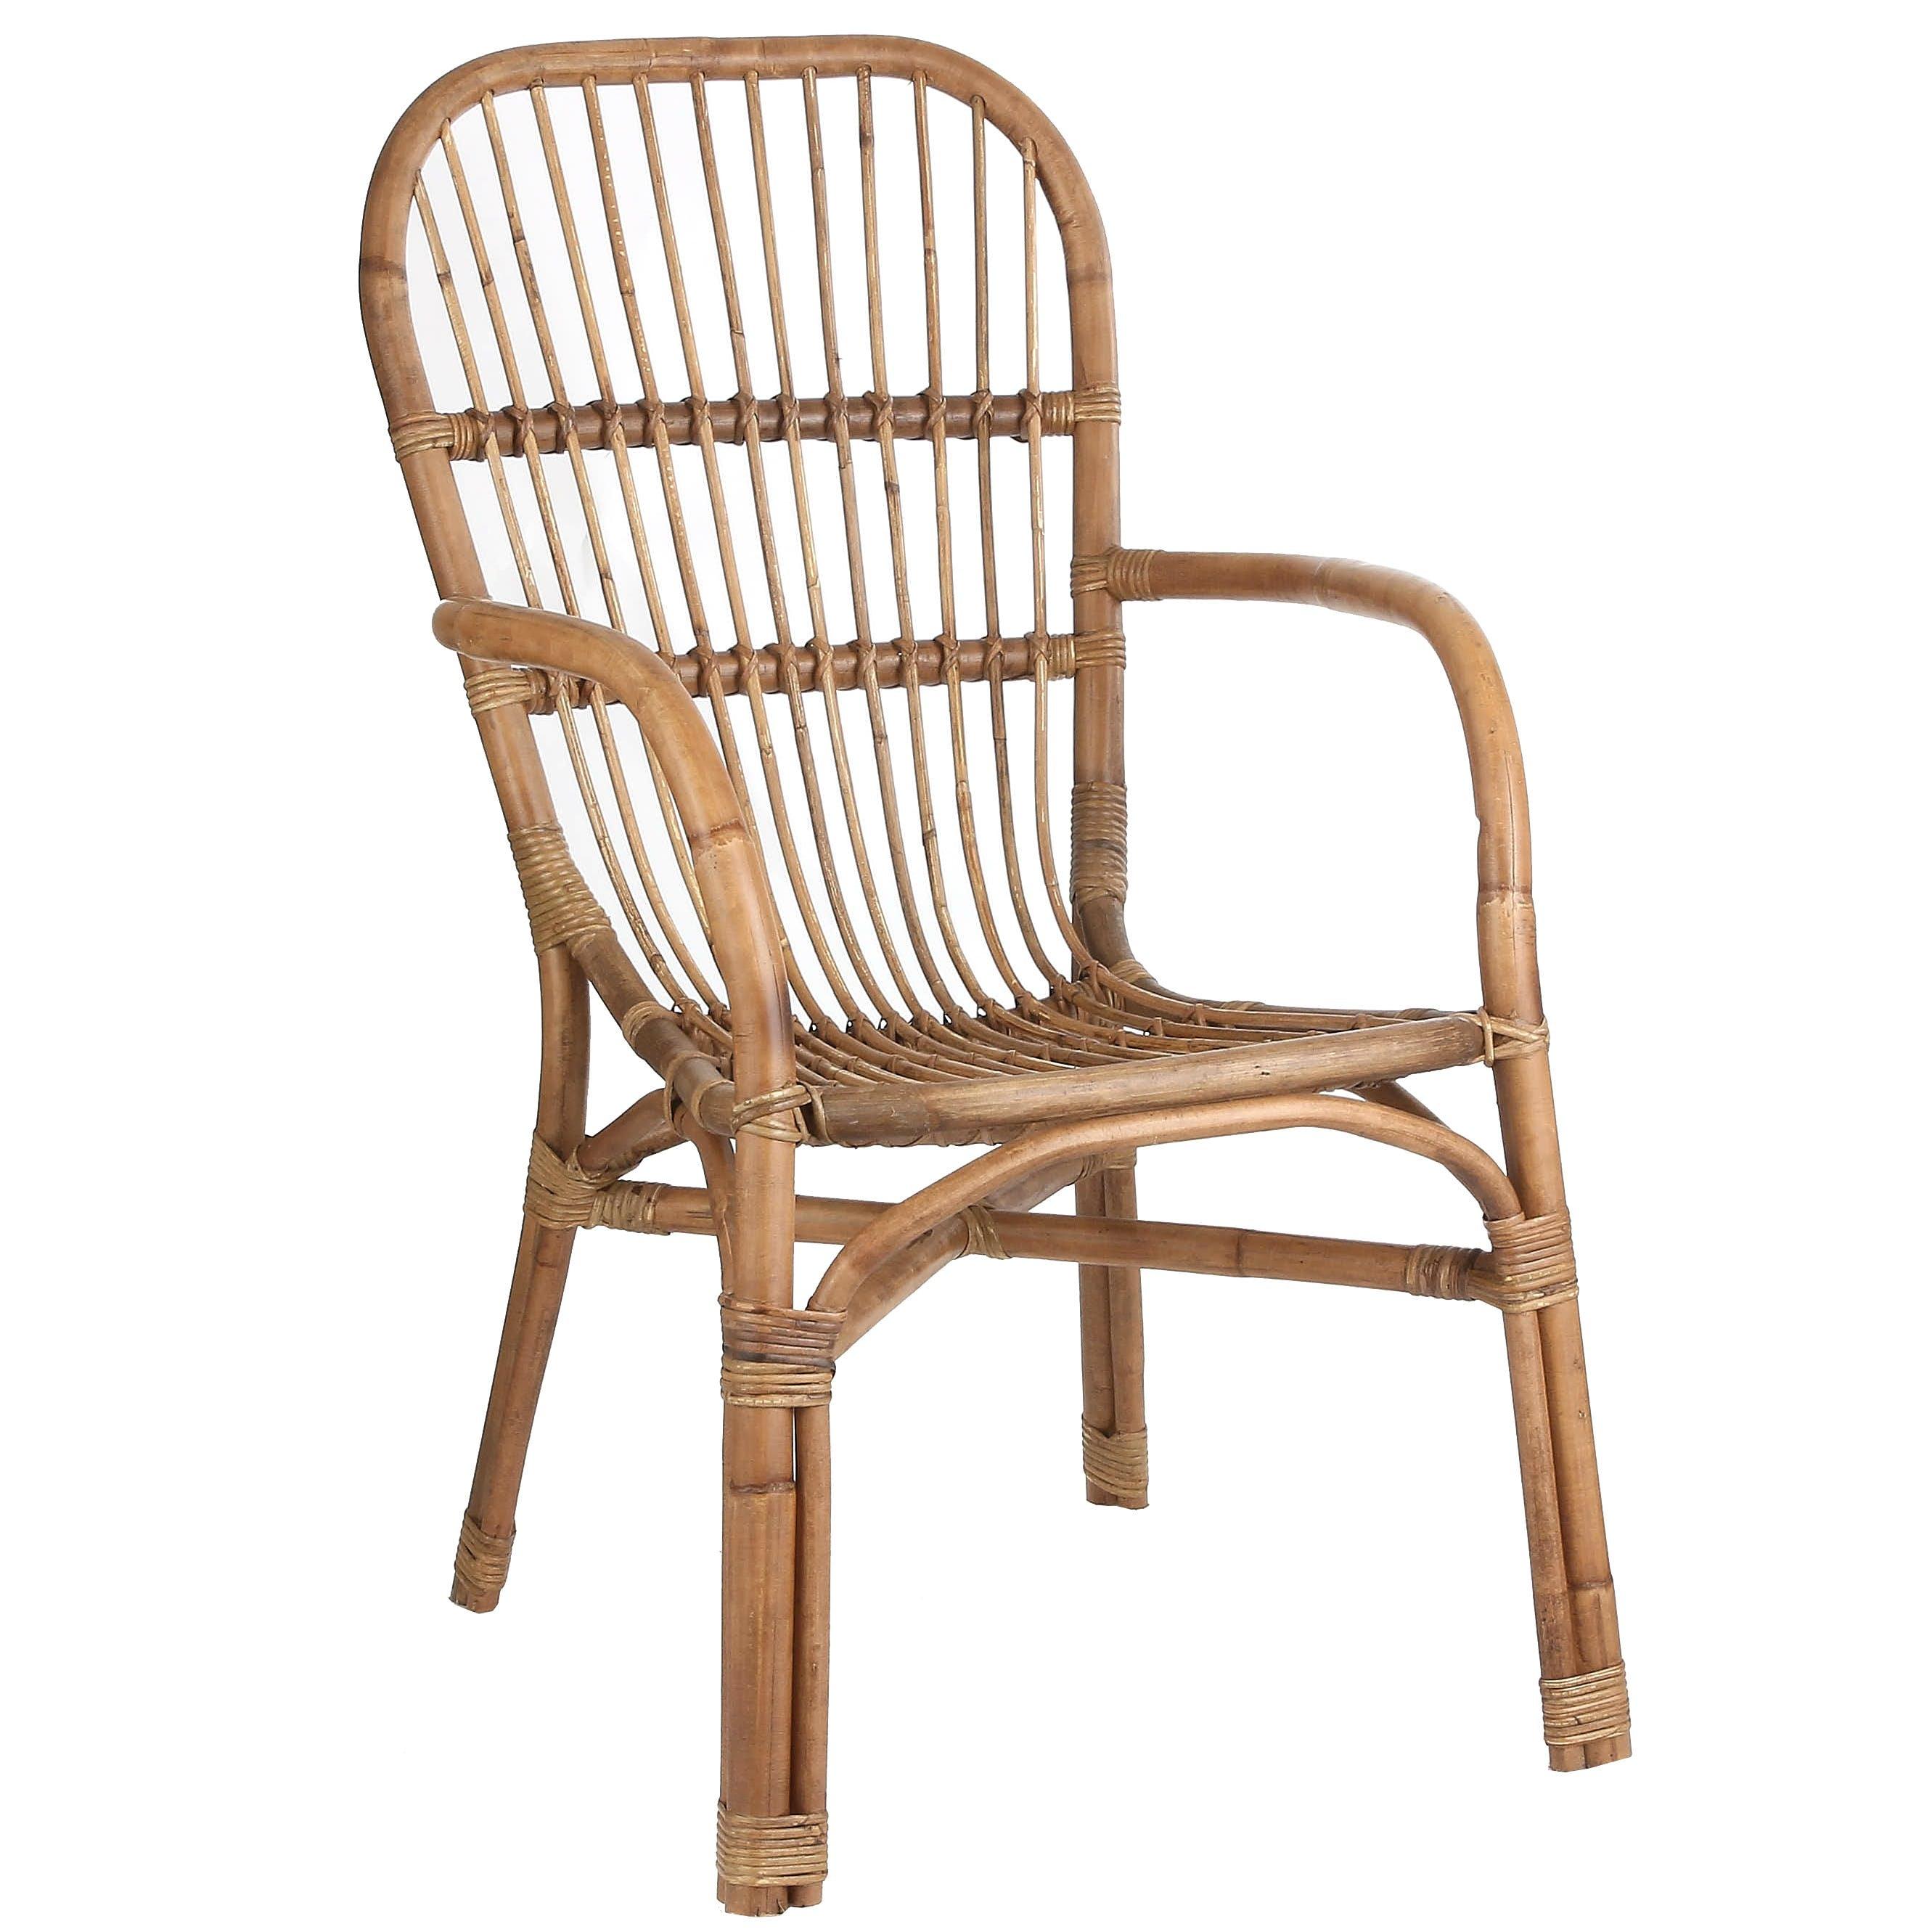 Chaise fauteuil en rotin naturel